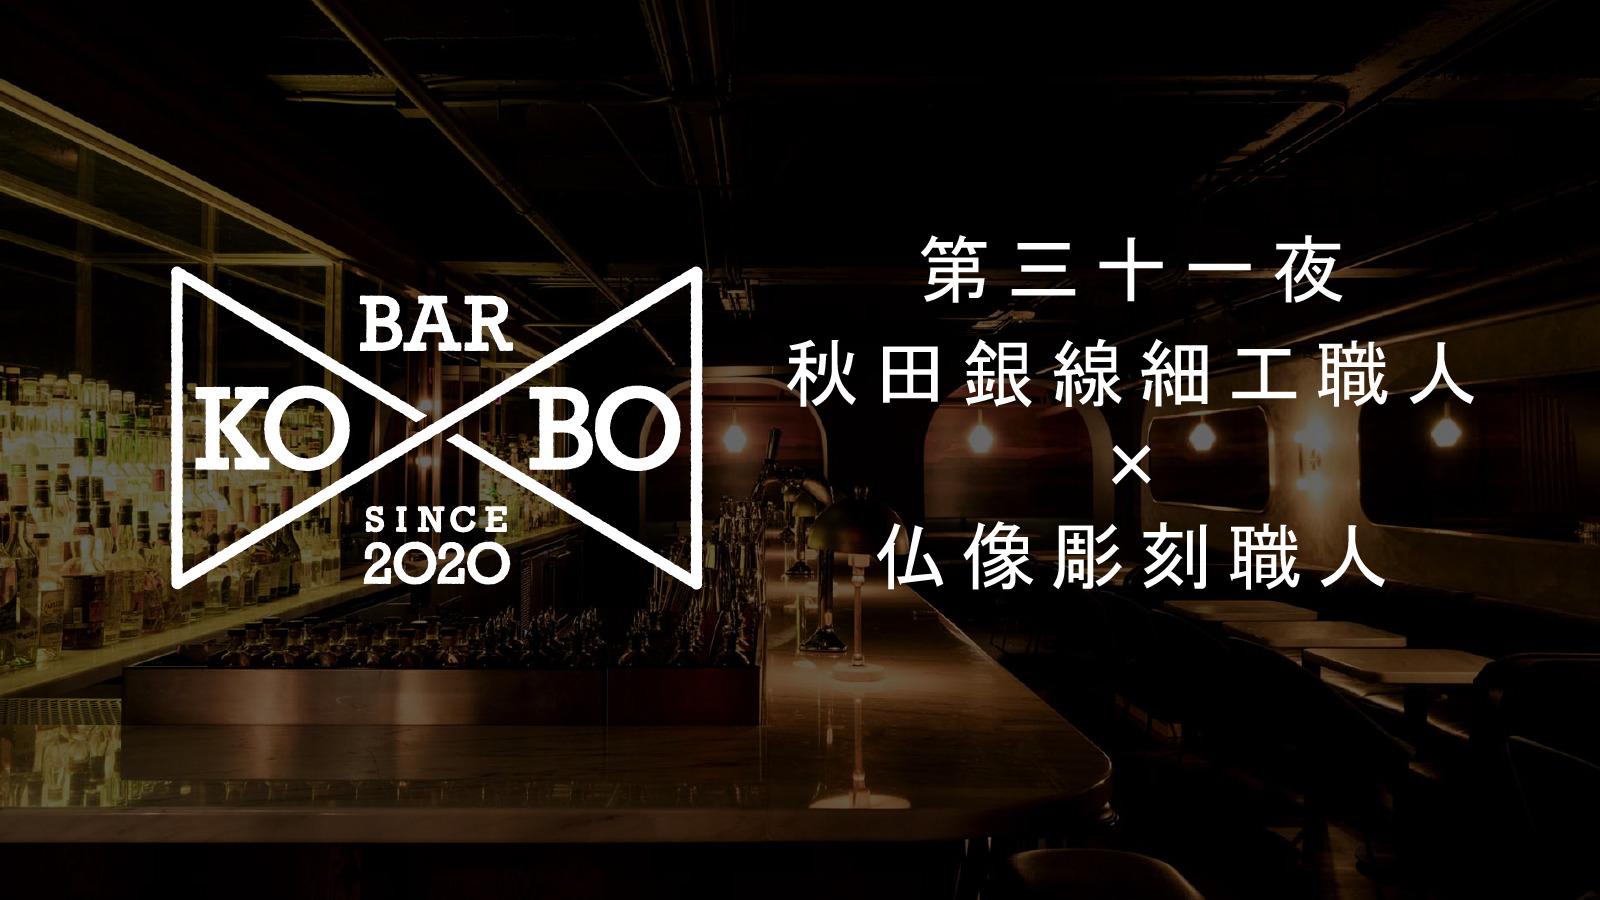 【Bar KO-BO 第三十一夜】秋田銀線細工職人×仏像彫刻職人